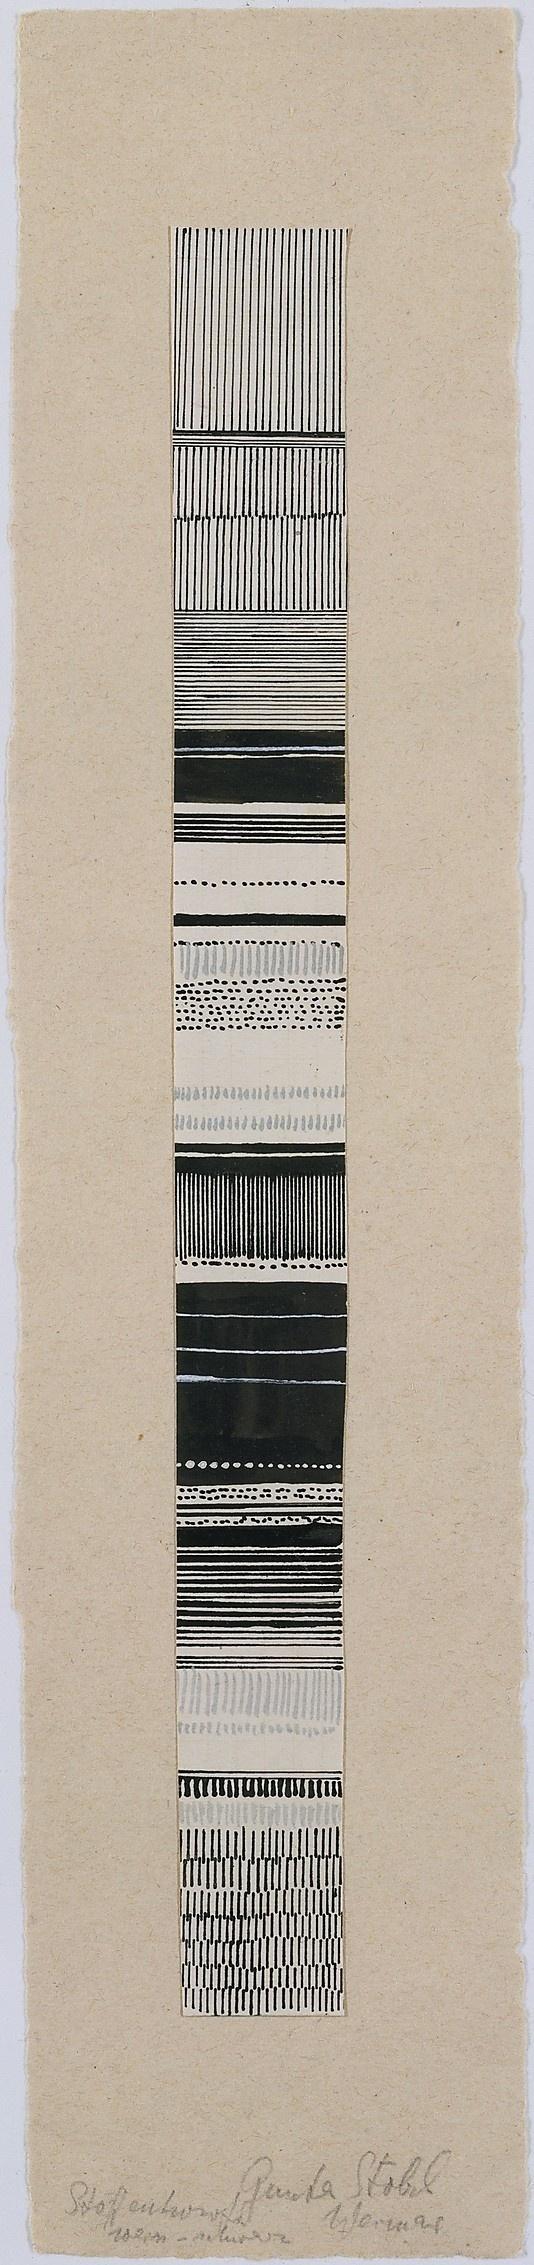 Gunta Stölzl - Watercolor and ink fabric design, 1919–1925. Bauhaus Archive. #stlzl #gunta